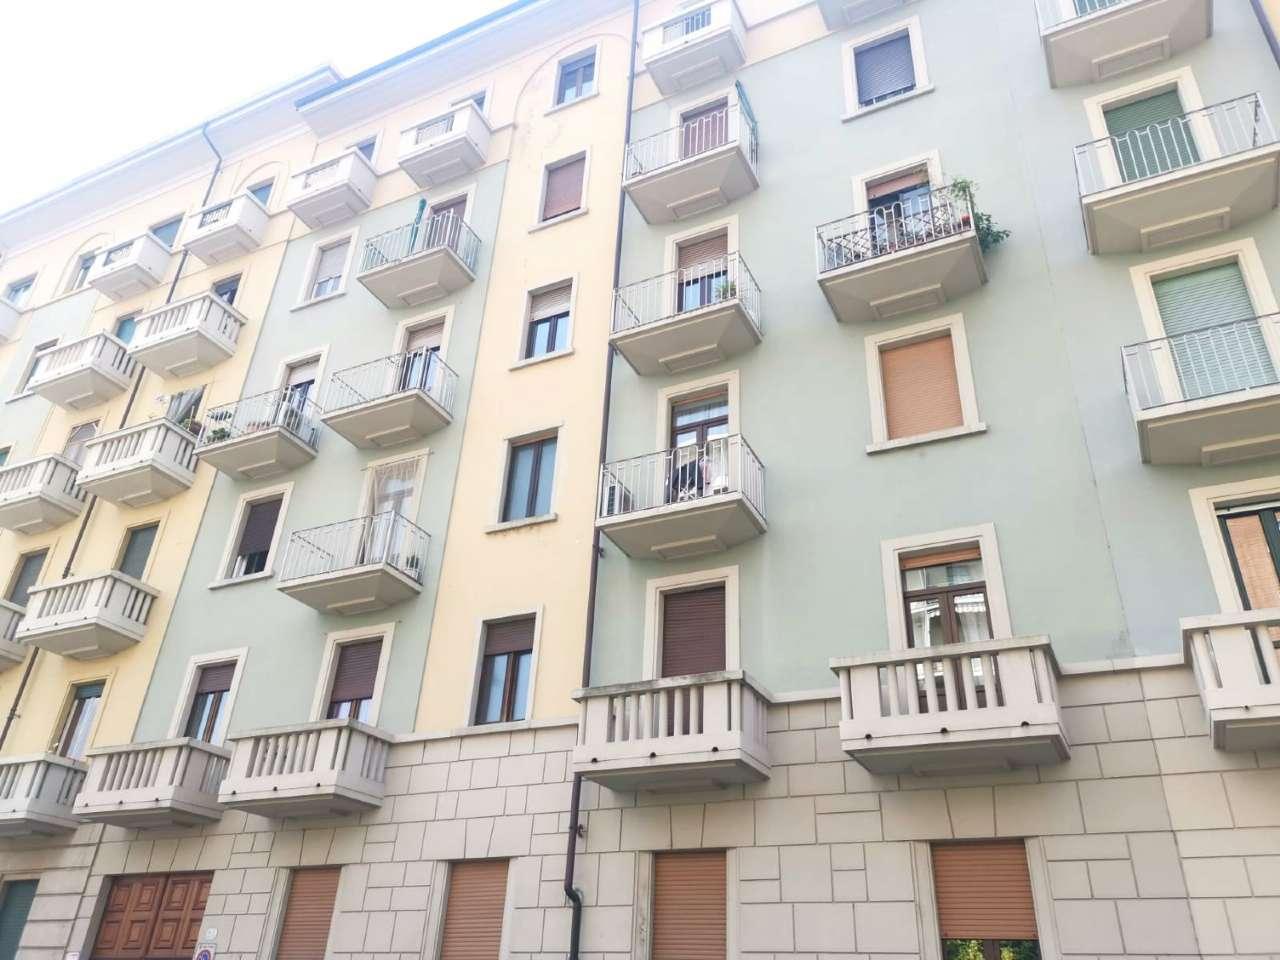 Appartamento in vendita Zona Madonna di Campagna, Borgo Vittoria... - via Cardinal Massaia 21 Torino